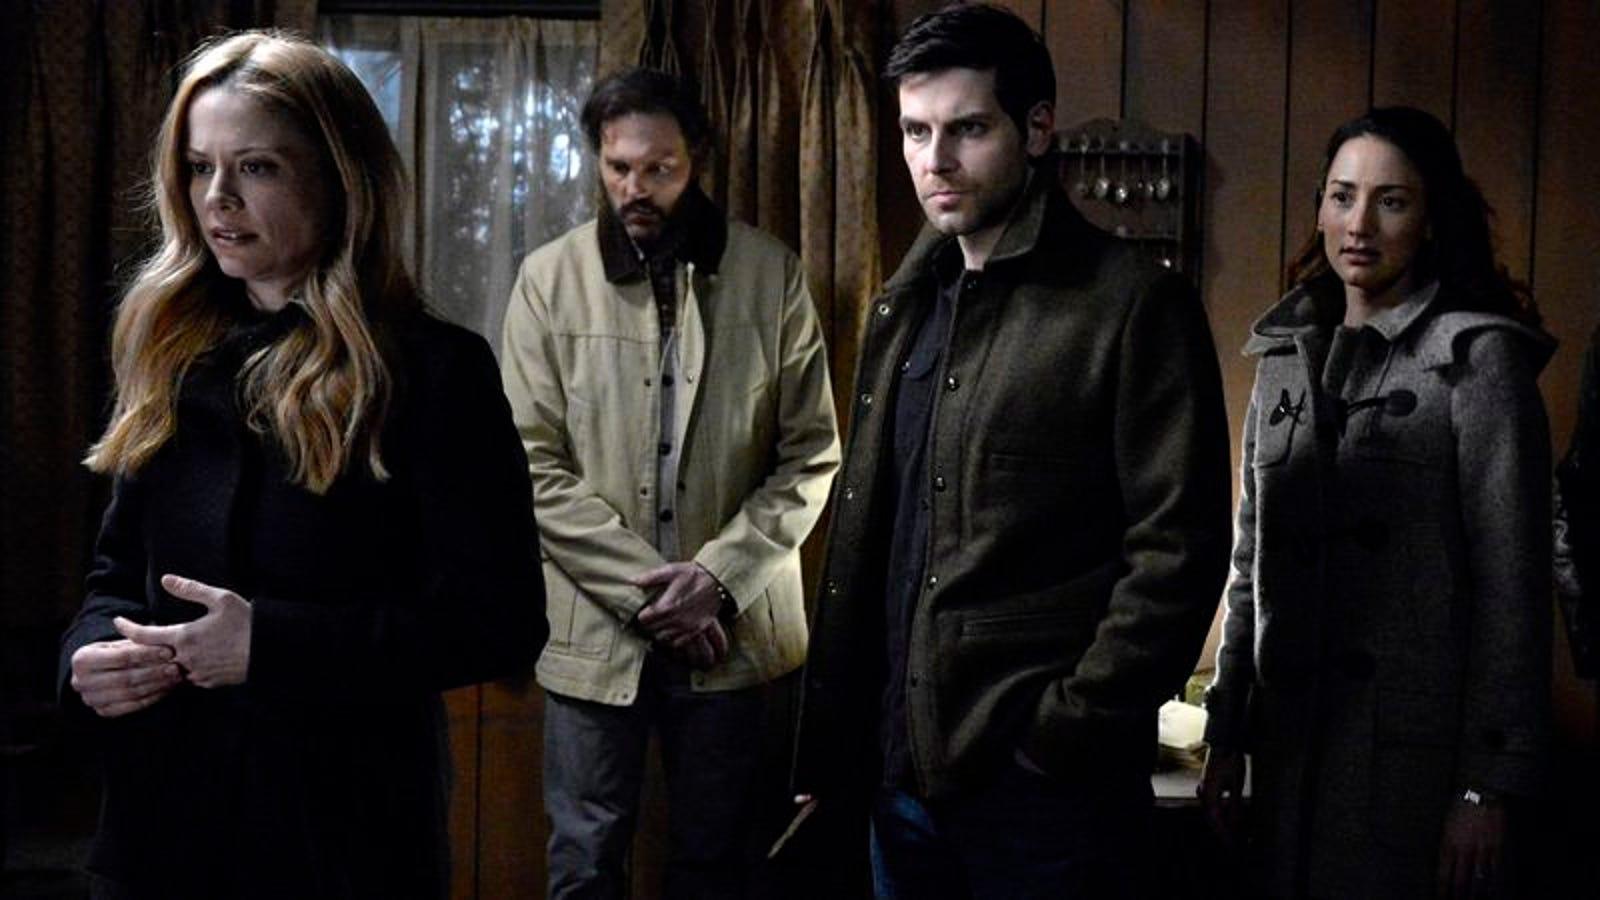 grimm season 6 episode 2 download